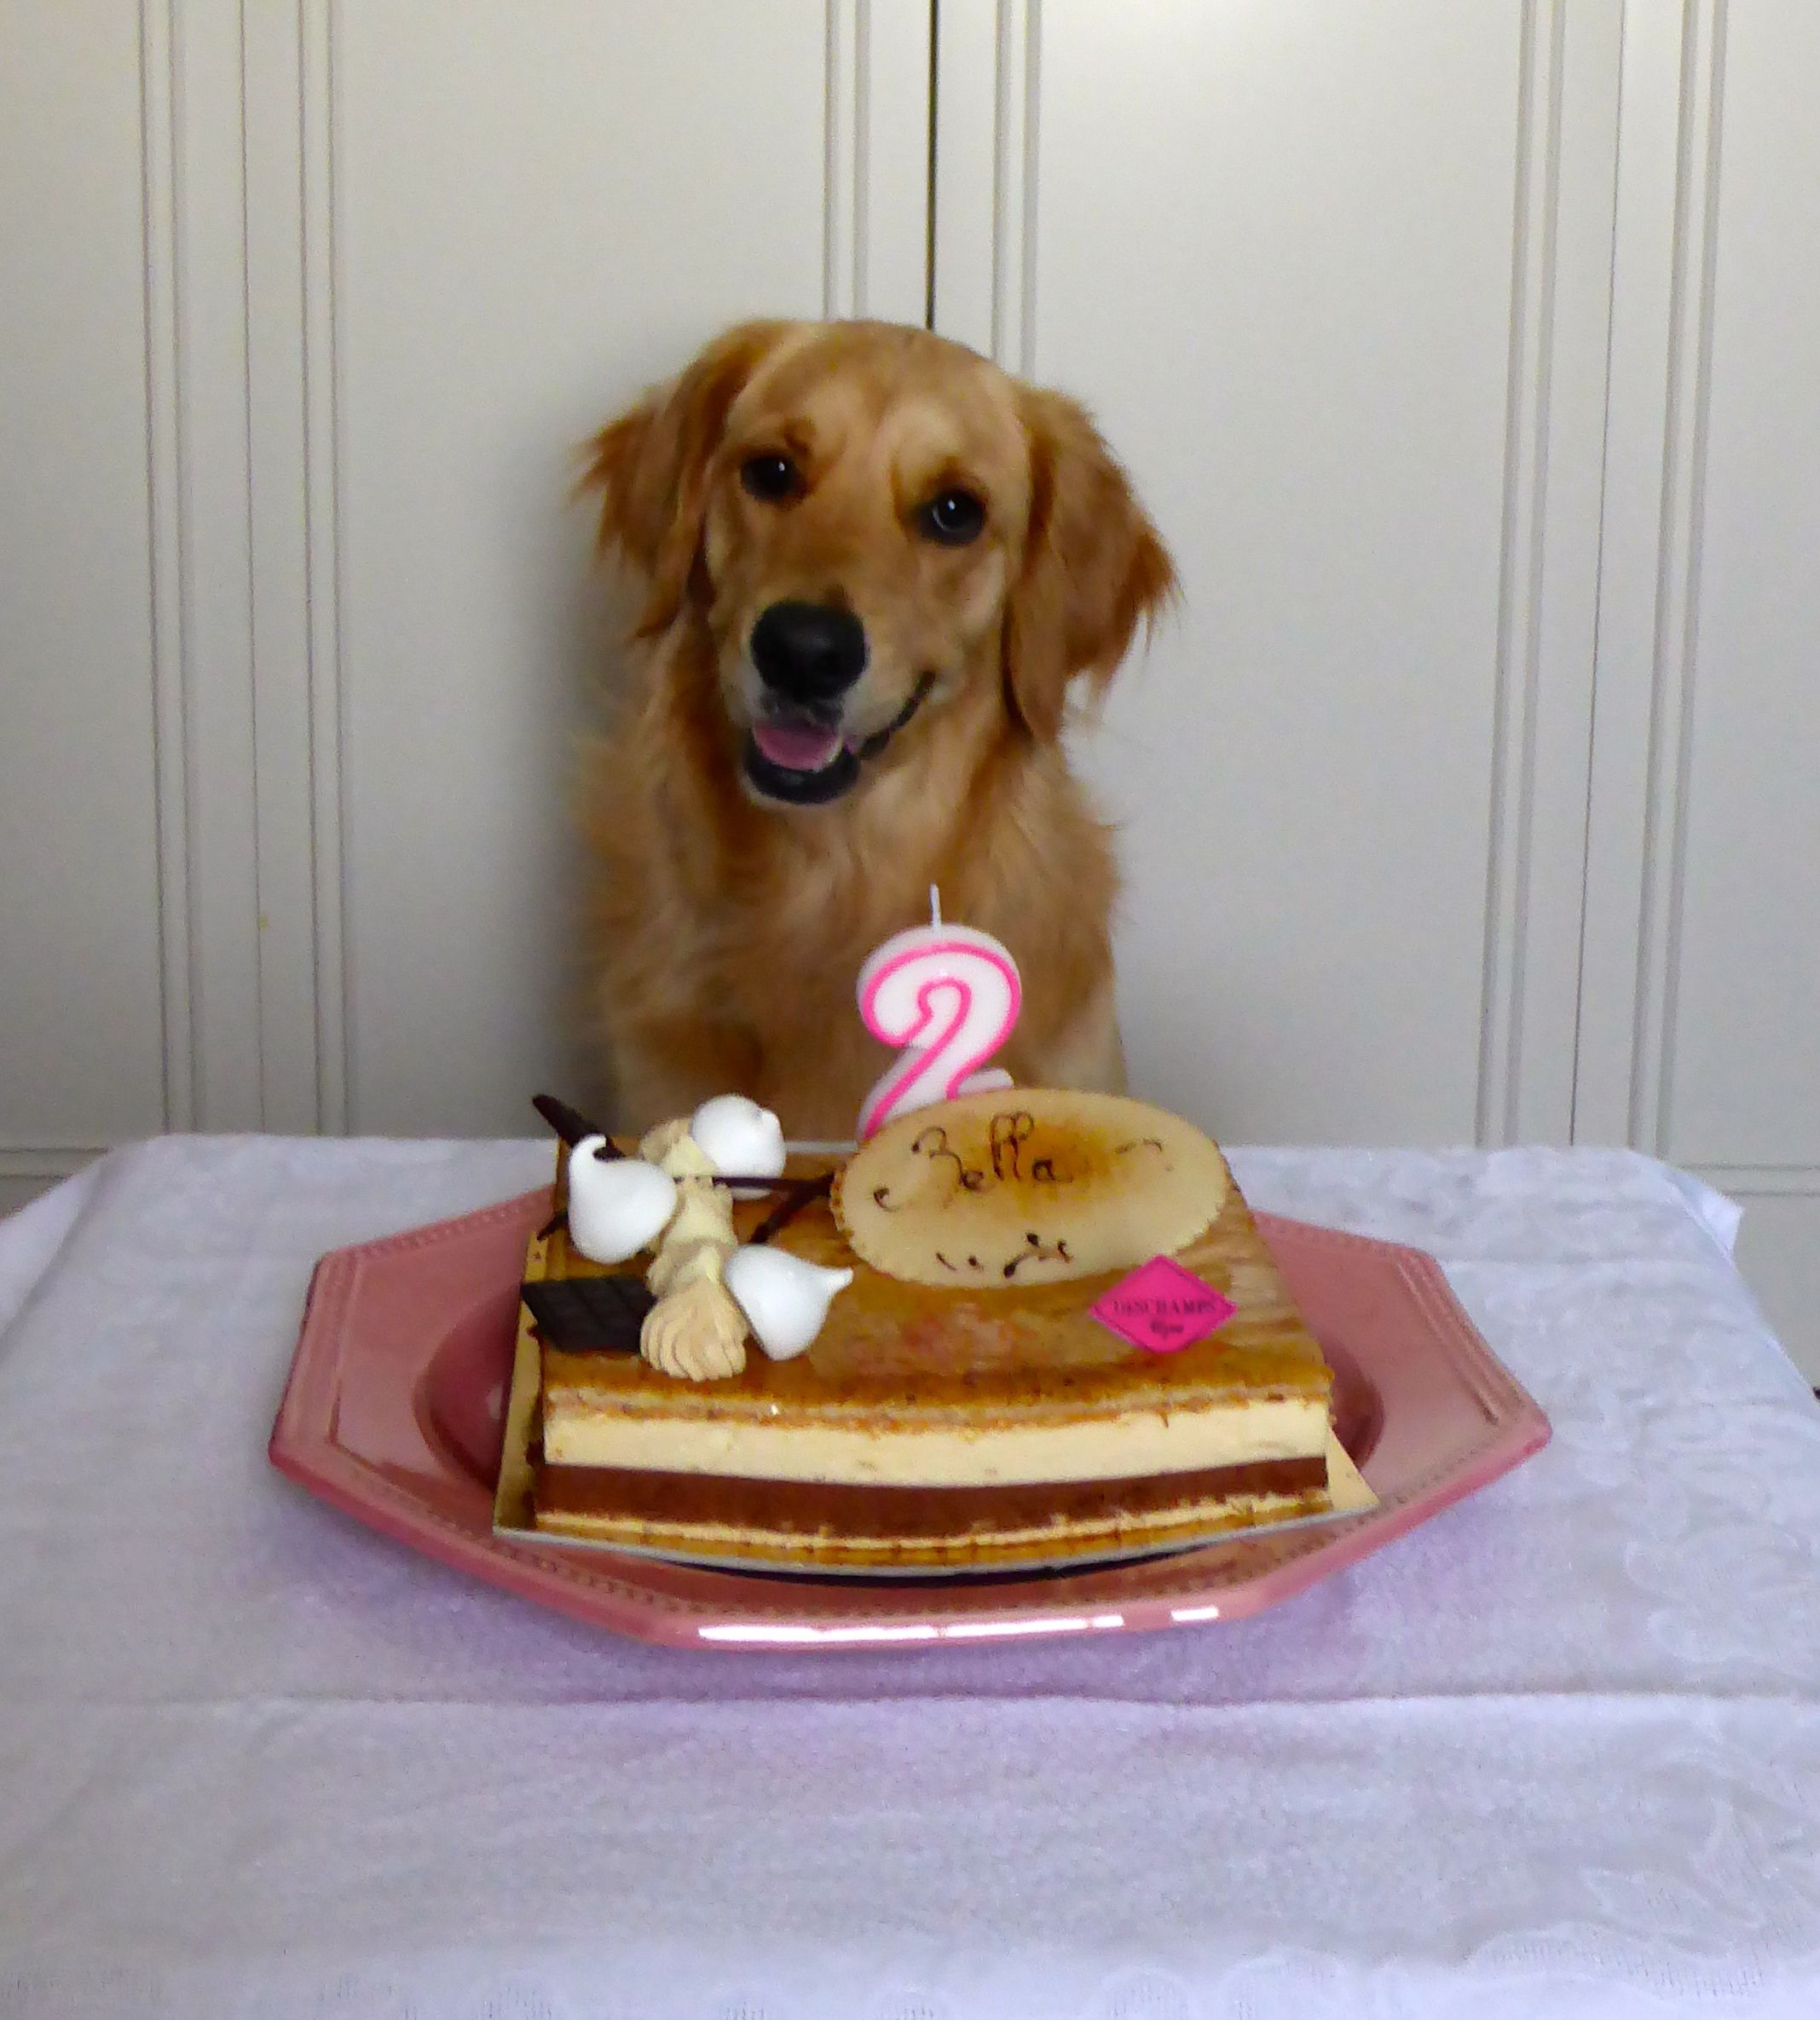 Chien Dog DogMom Photography Photographie Animaux Animals GoldenRetriever